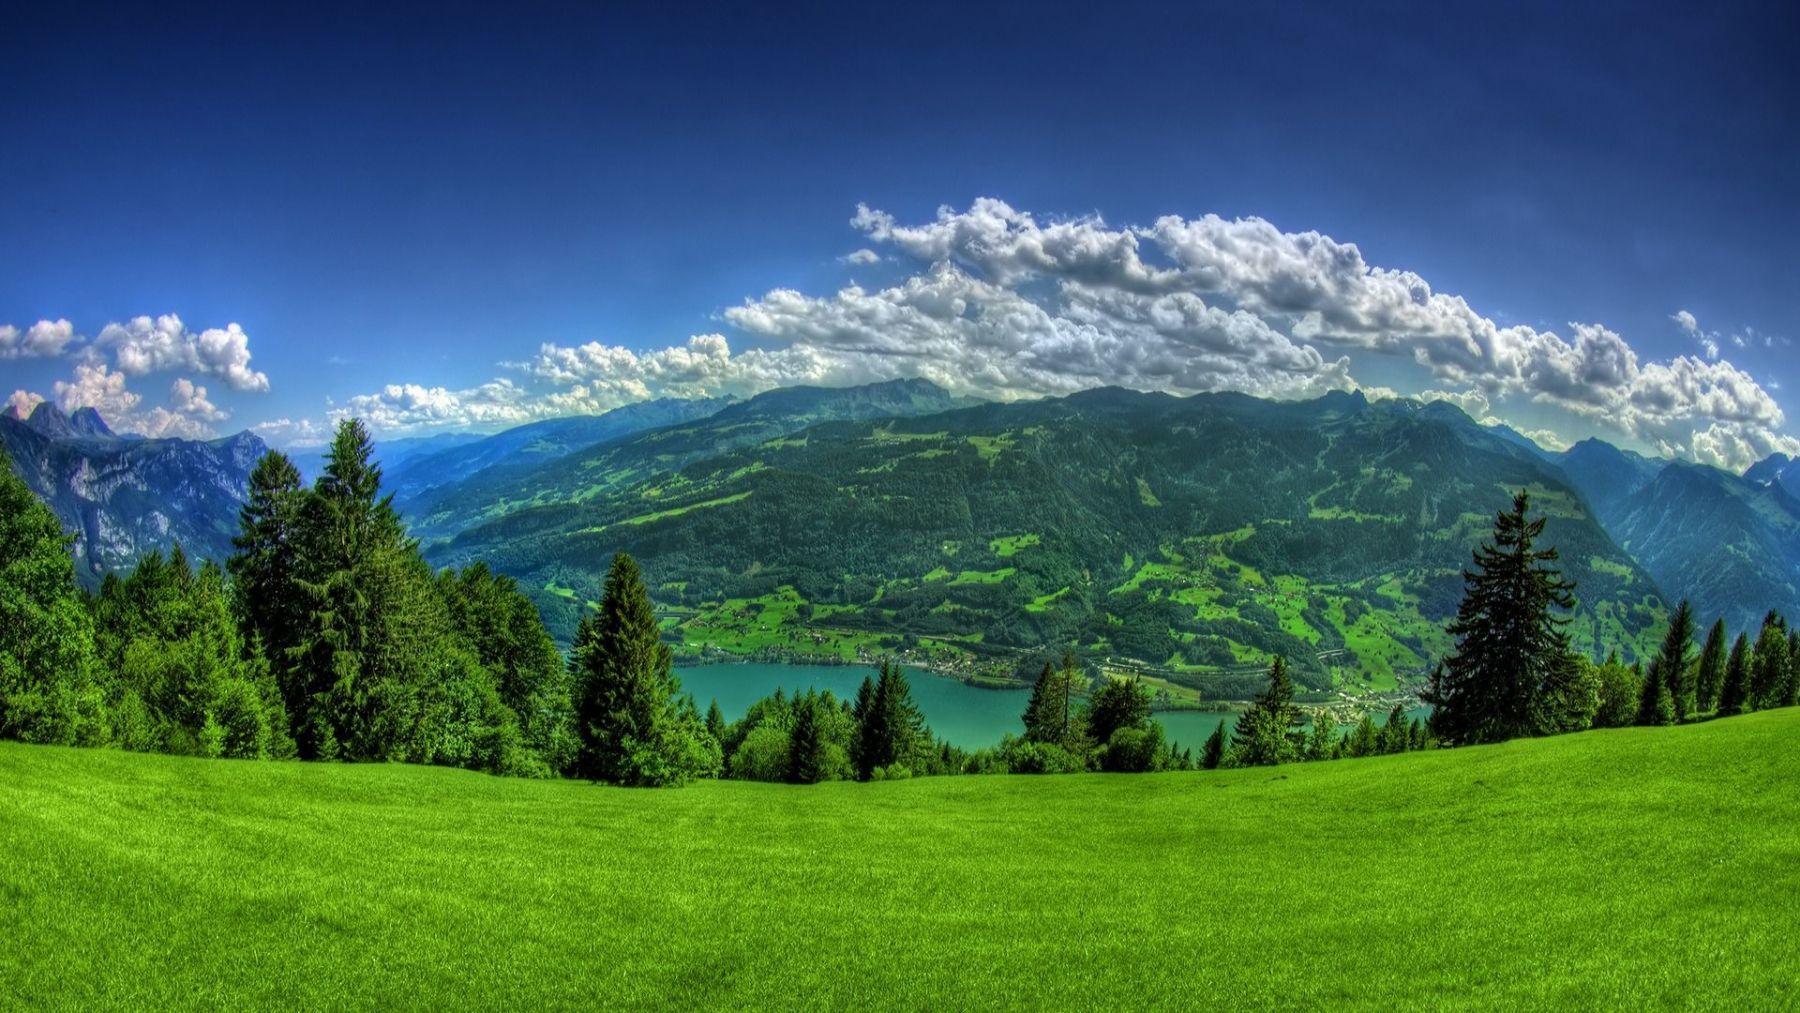 Grassland Wallpapers Top Free Grassland Backgrounds